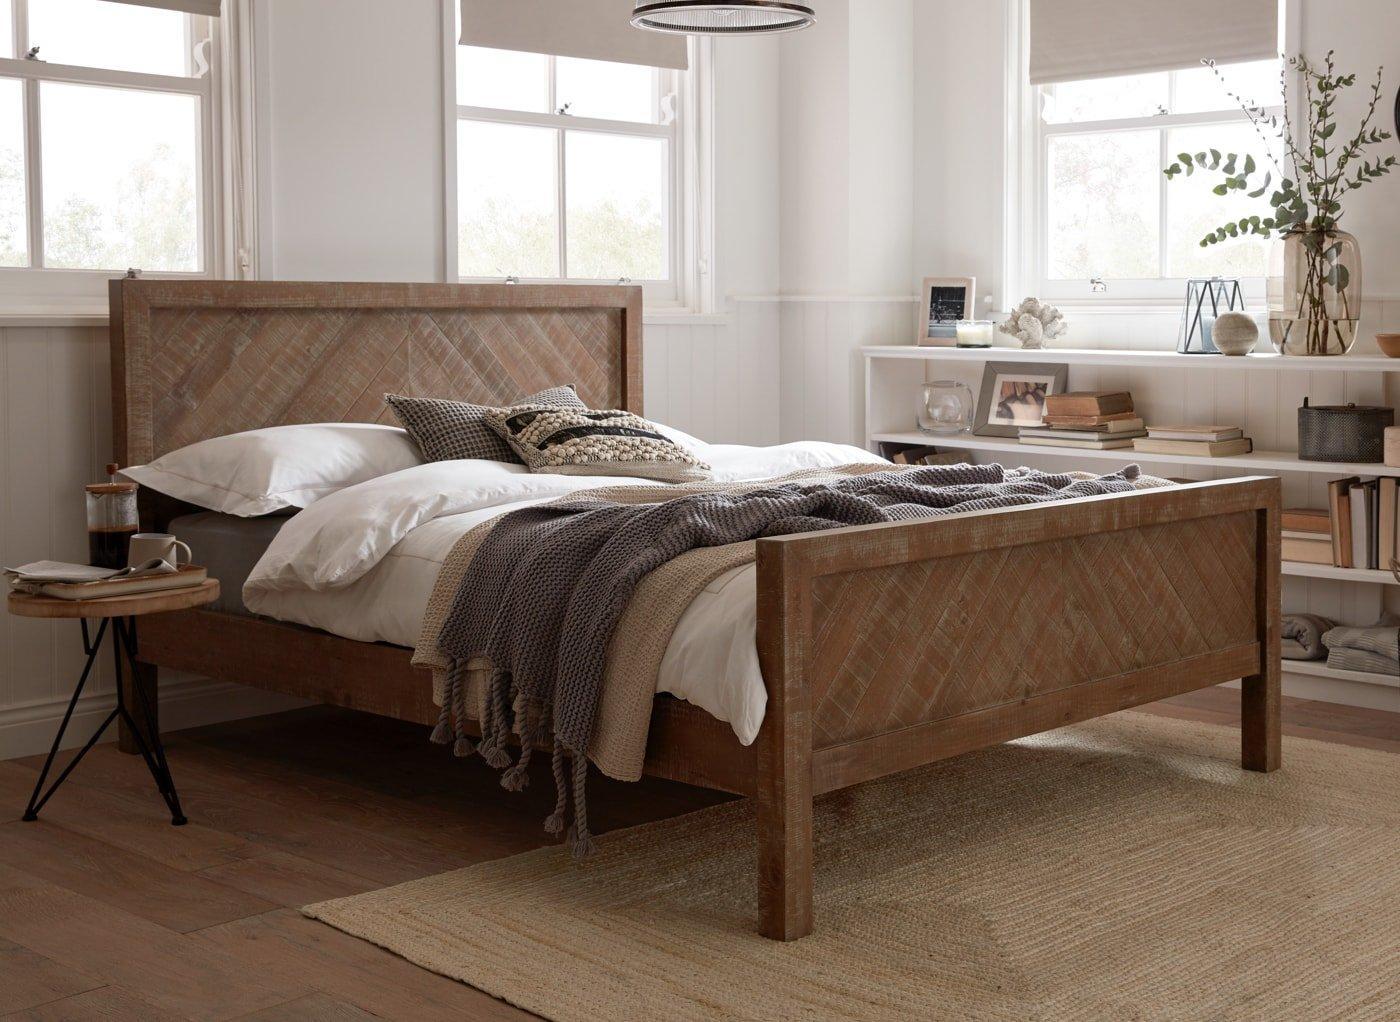 Leighton Wooden Bed Frame Dreams